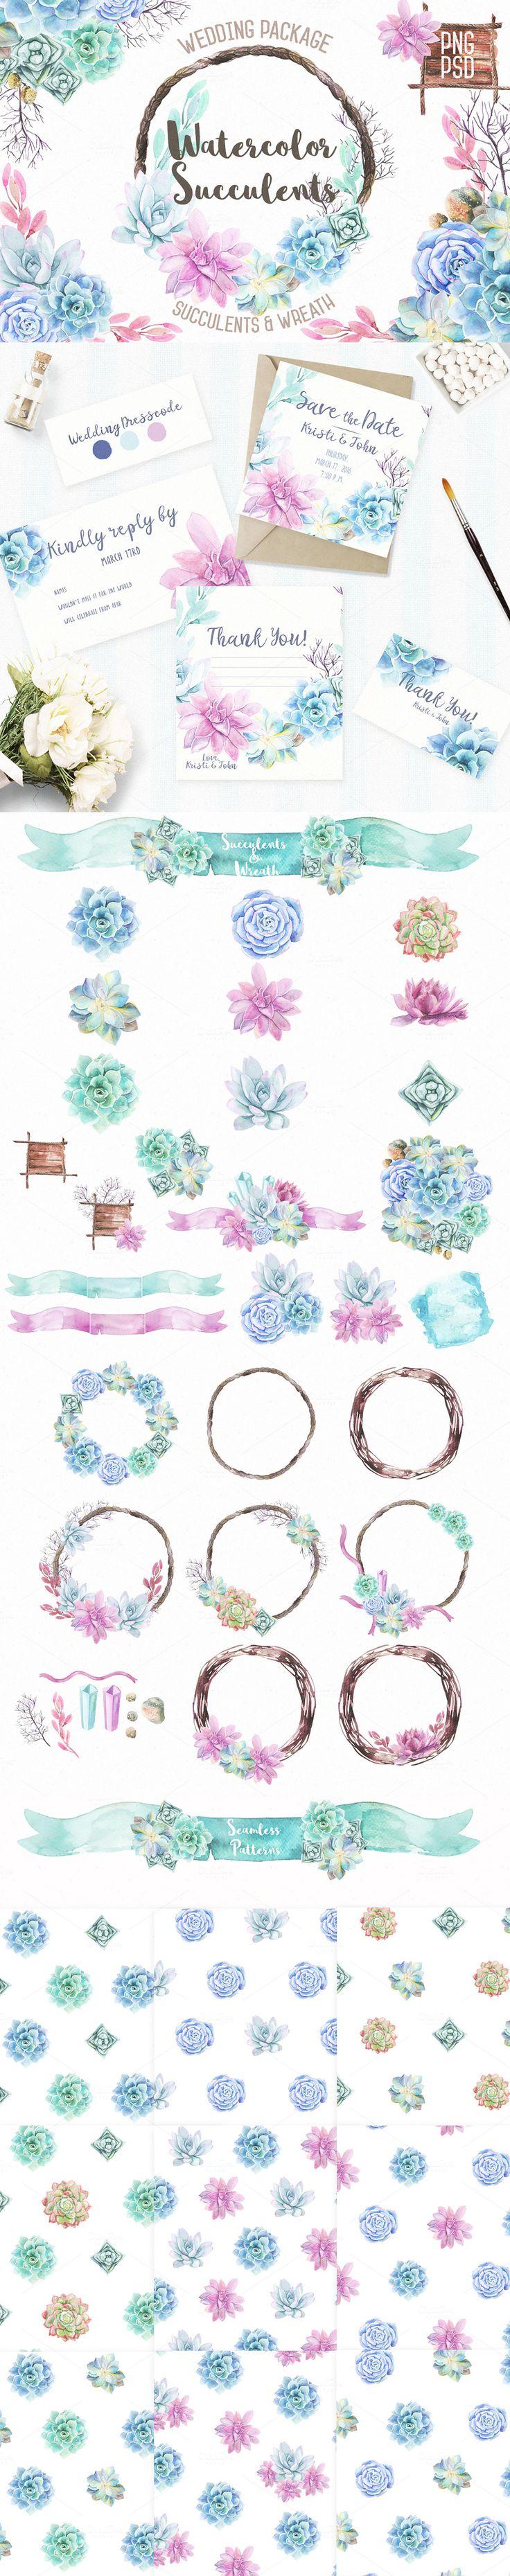 #Watercolor Succulents & Wreath #Illustrations